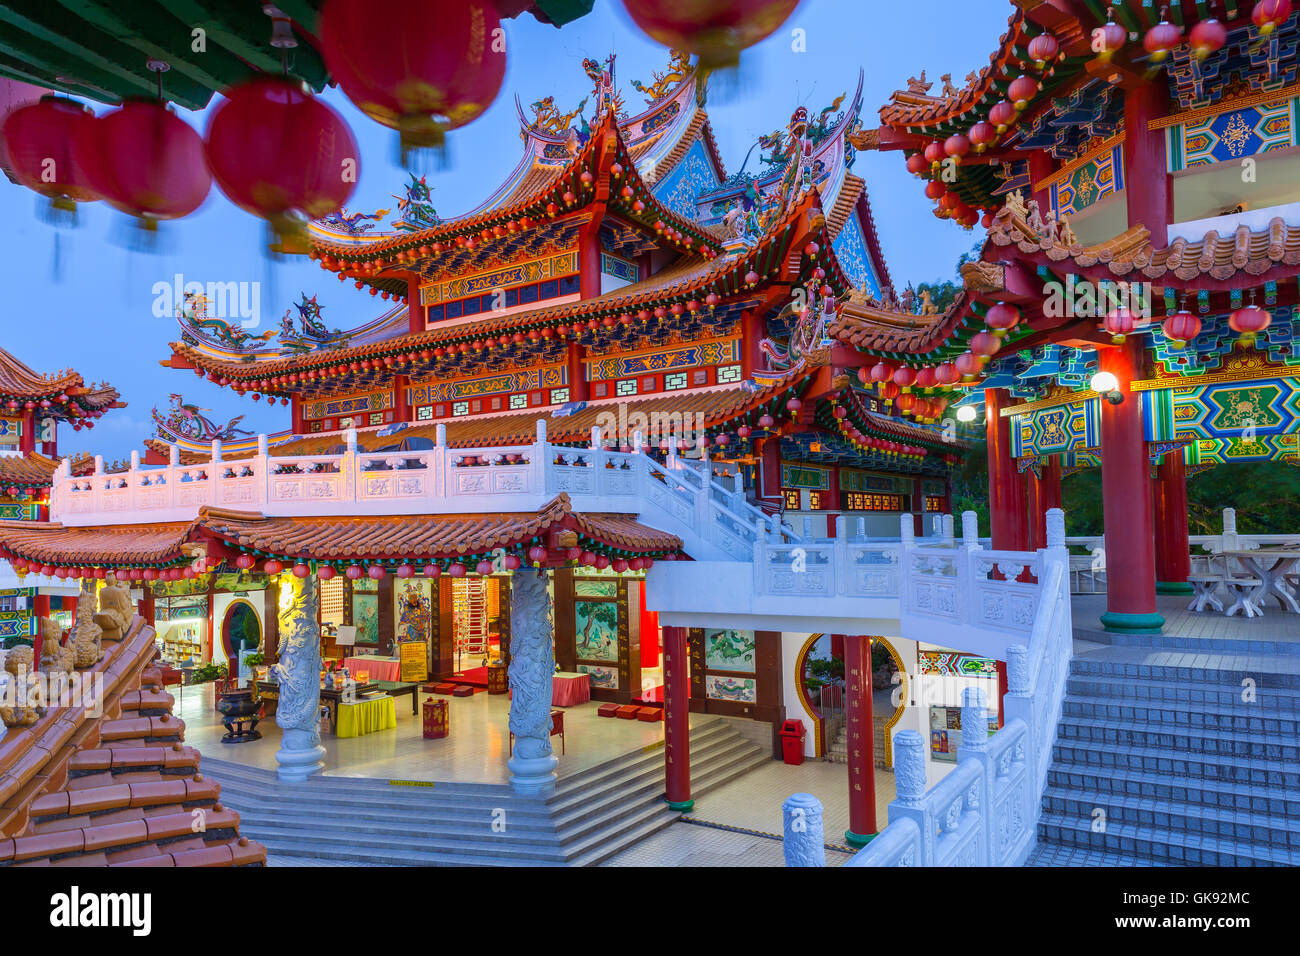 Thean Hou templo budista al anochecer, Kuala Lumpur, Malasia Imagen De Stock